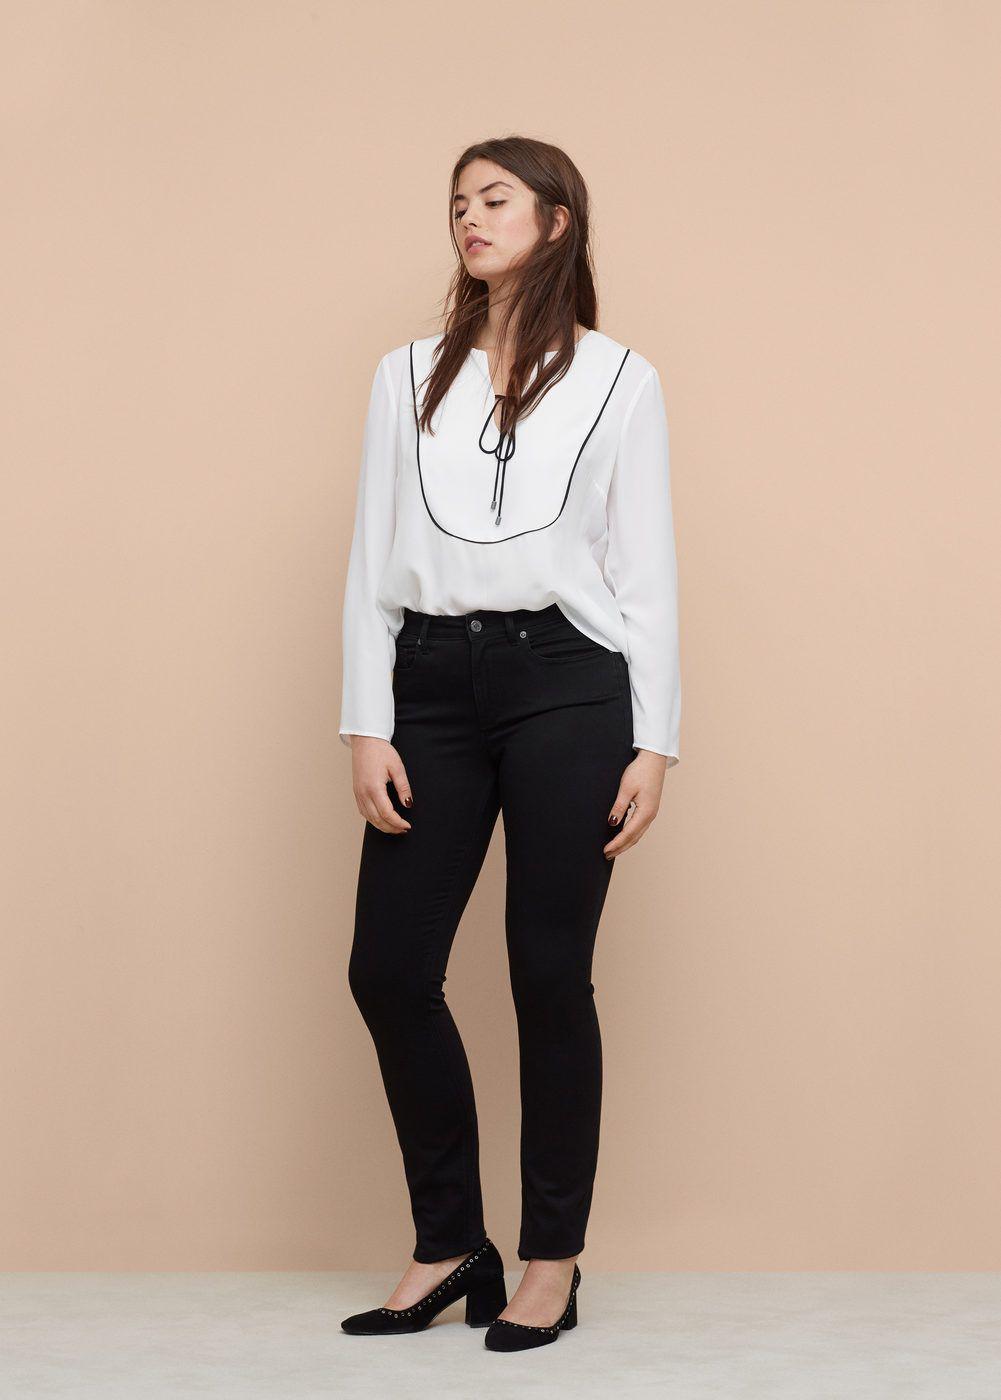 Plus Zip Jeans Wardrobes Fit Black Sizes Valentin And Slim wztvf